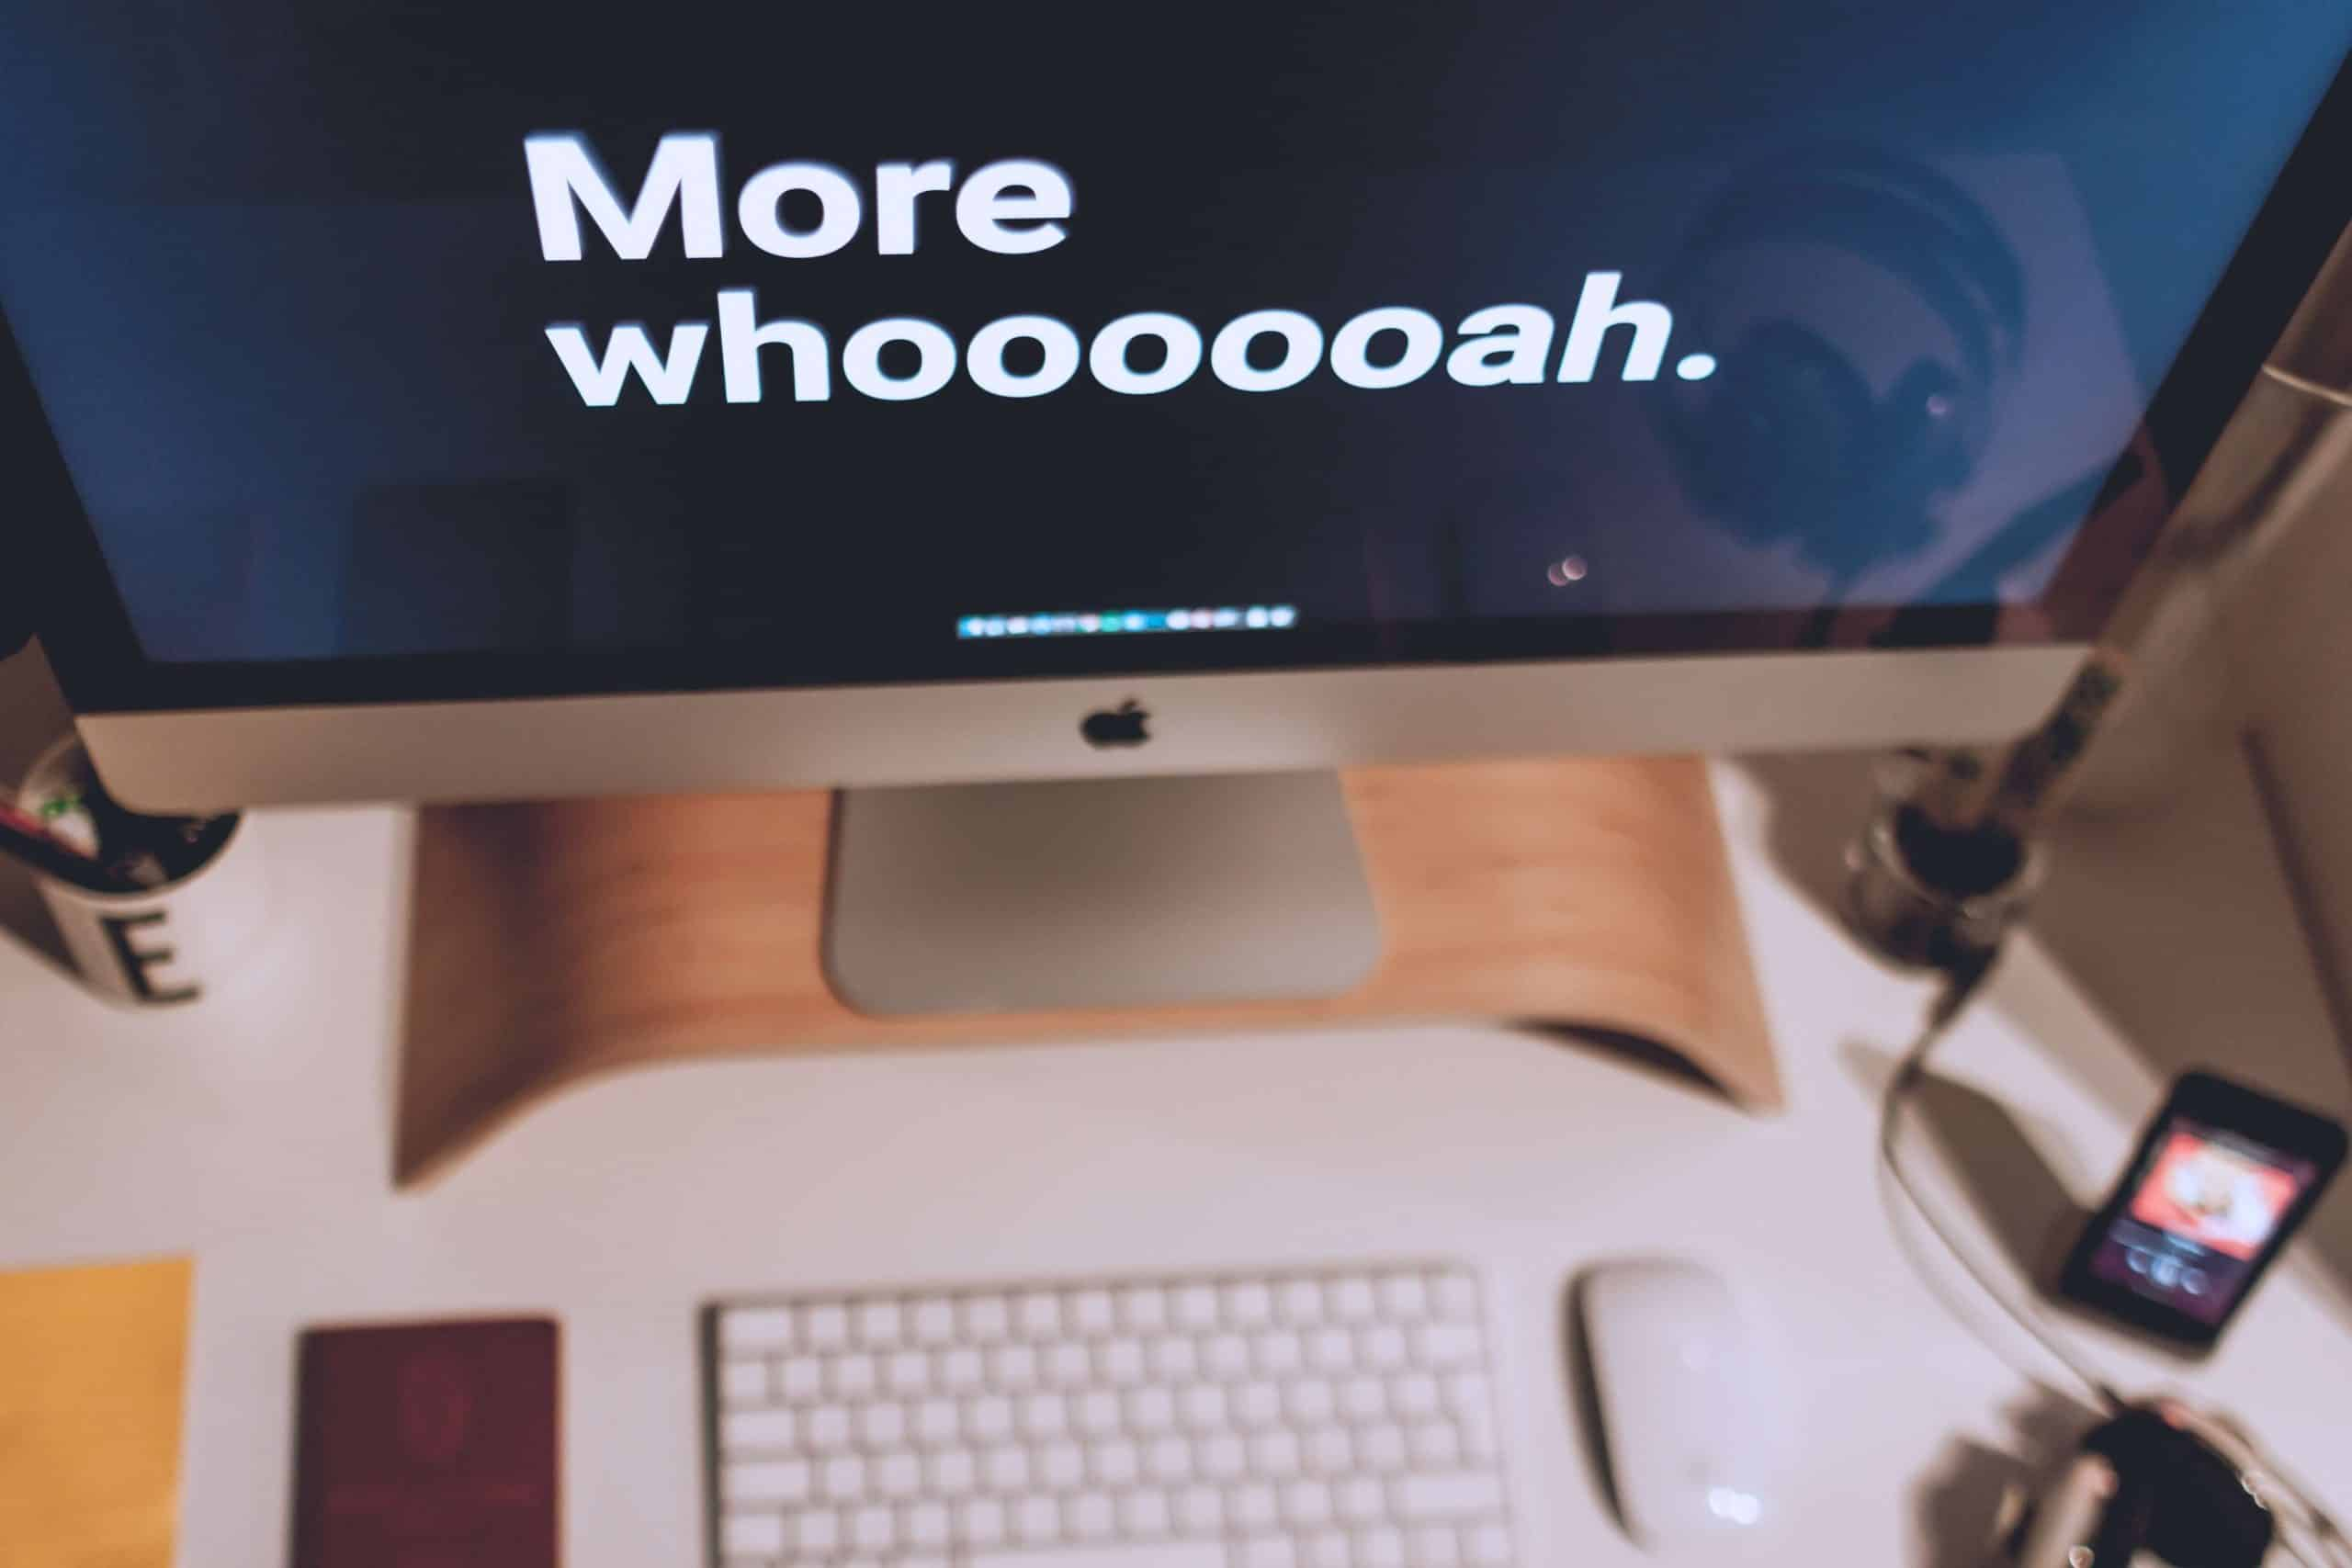 imac-mk482-27-inch-2015-laptopvang.com